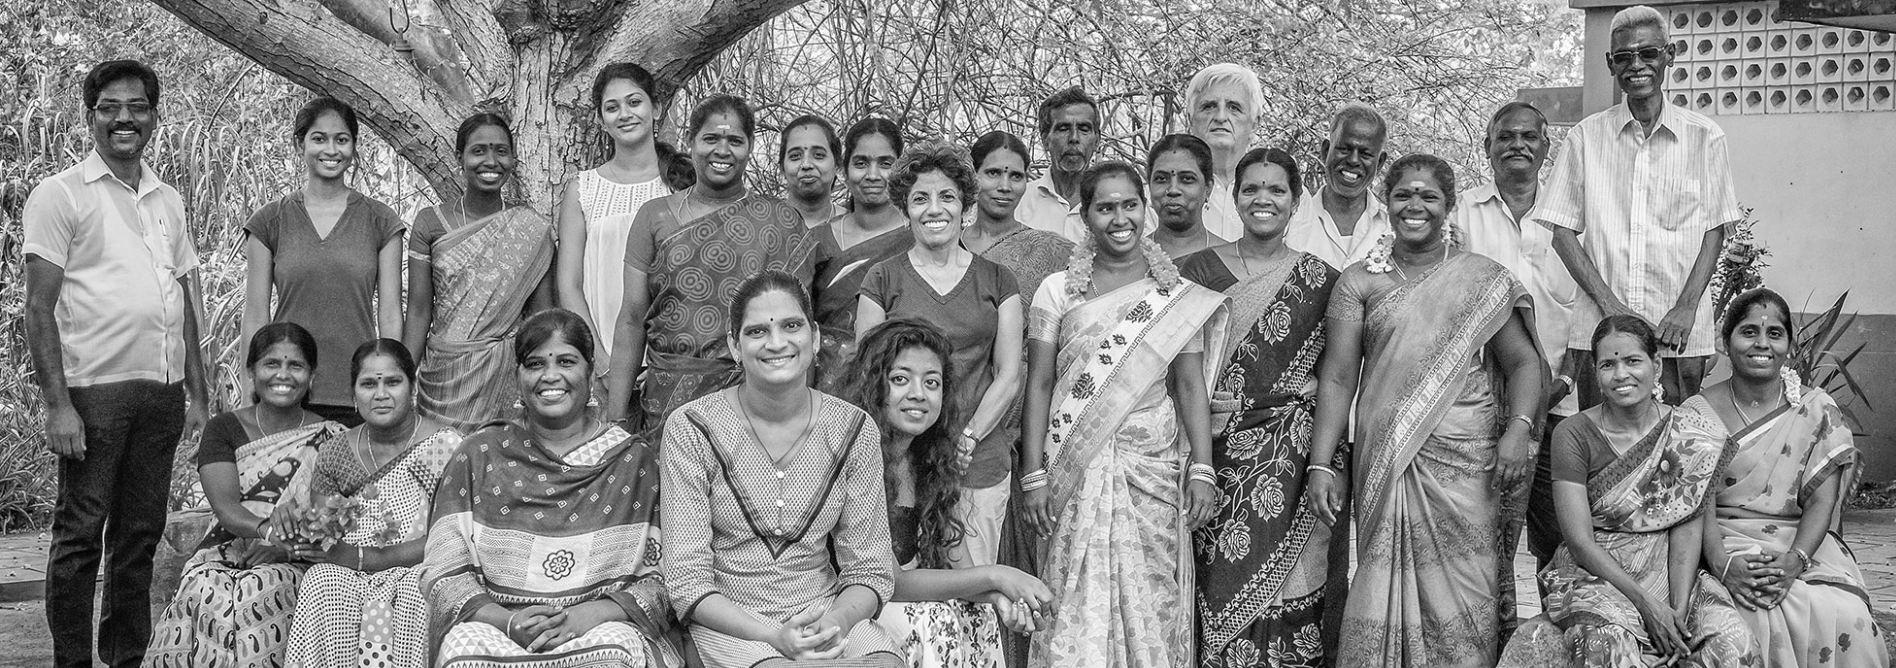 The team of Shradhanjali